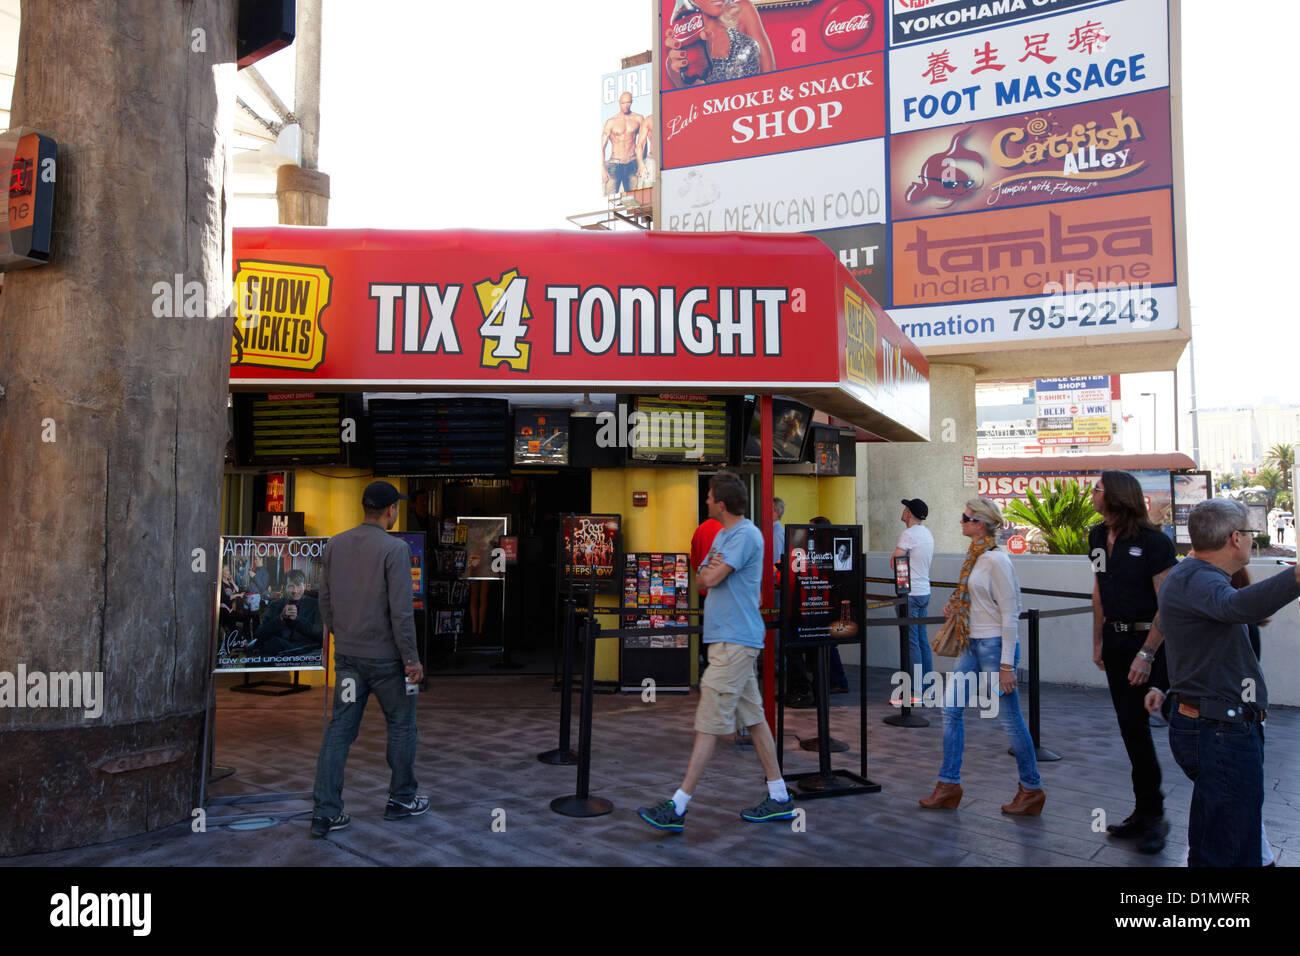 tix 4 tonight discount show tickets booth on Las Vegas boulevard Nevada USA - Stock Image